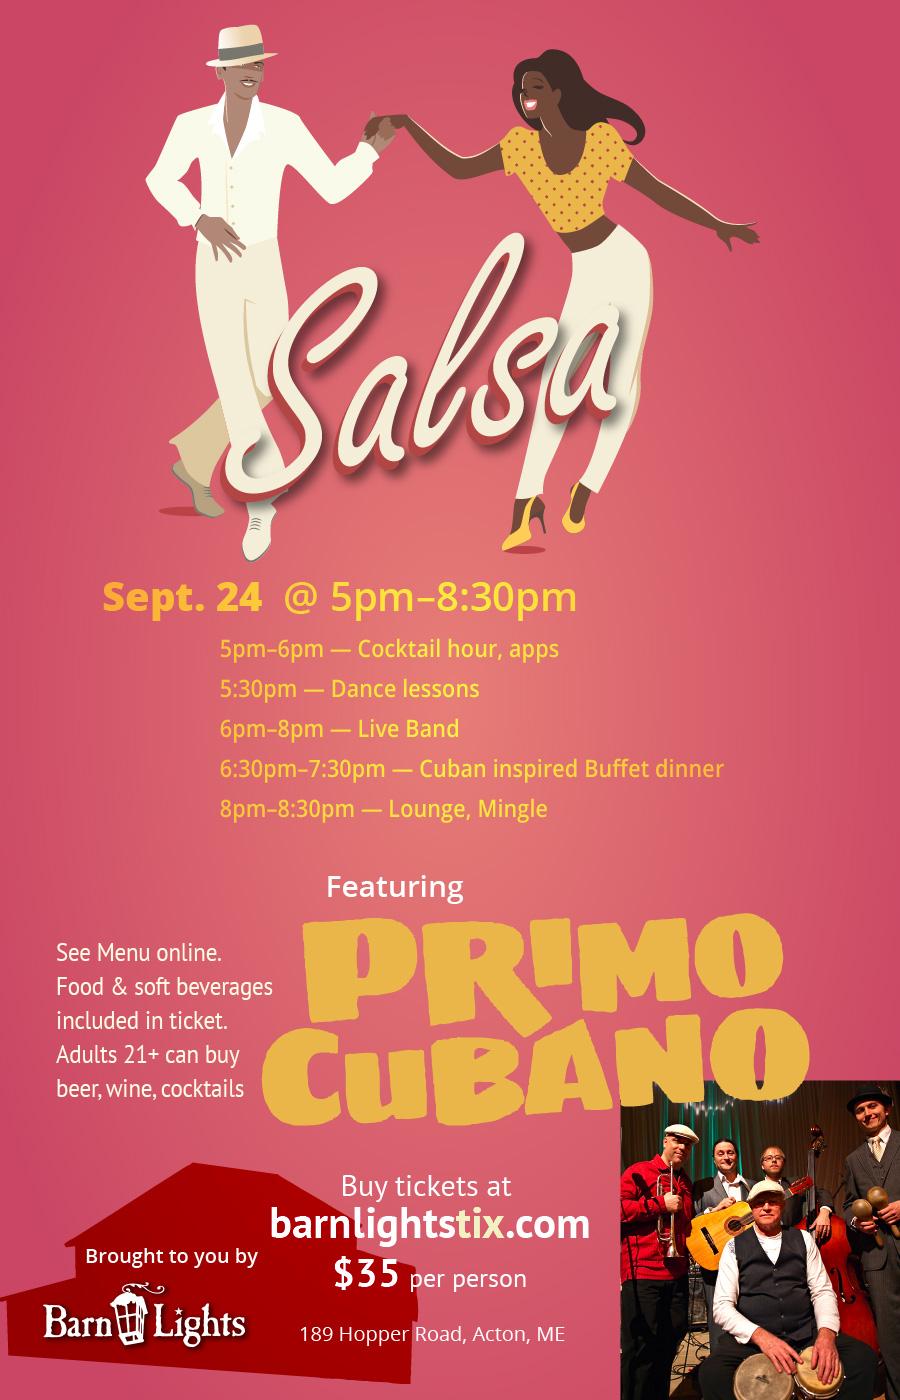 primo-cubano-salsa-night-final-9-24